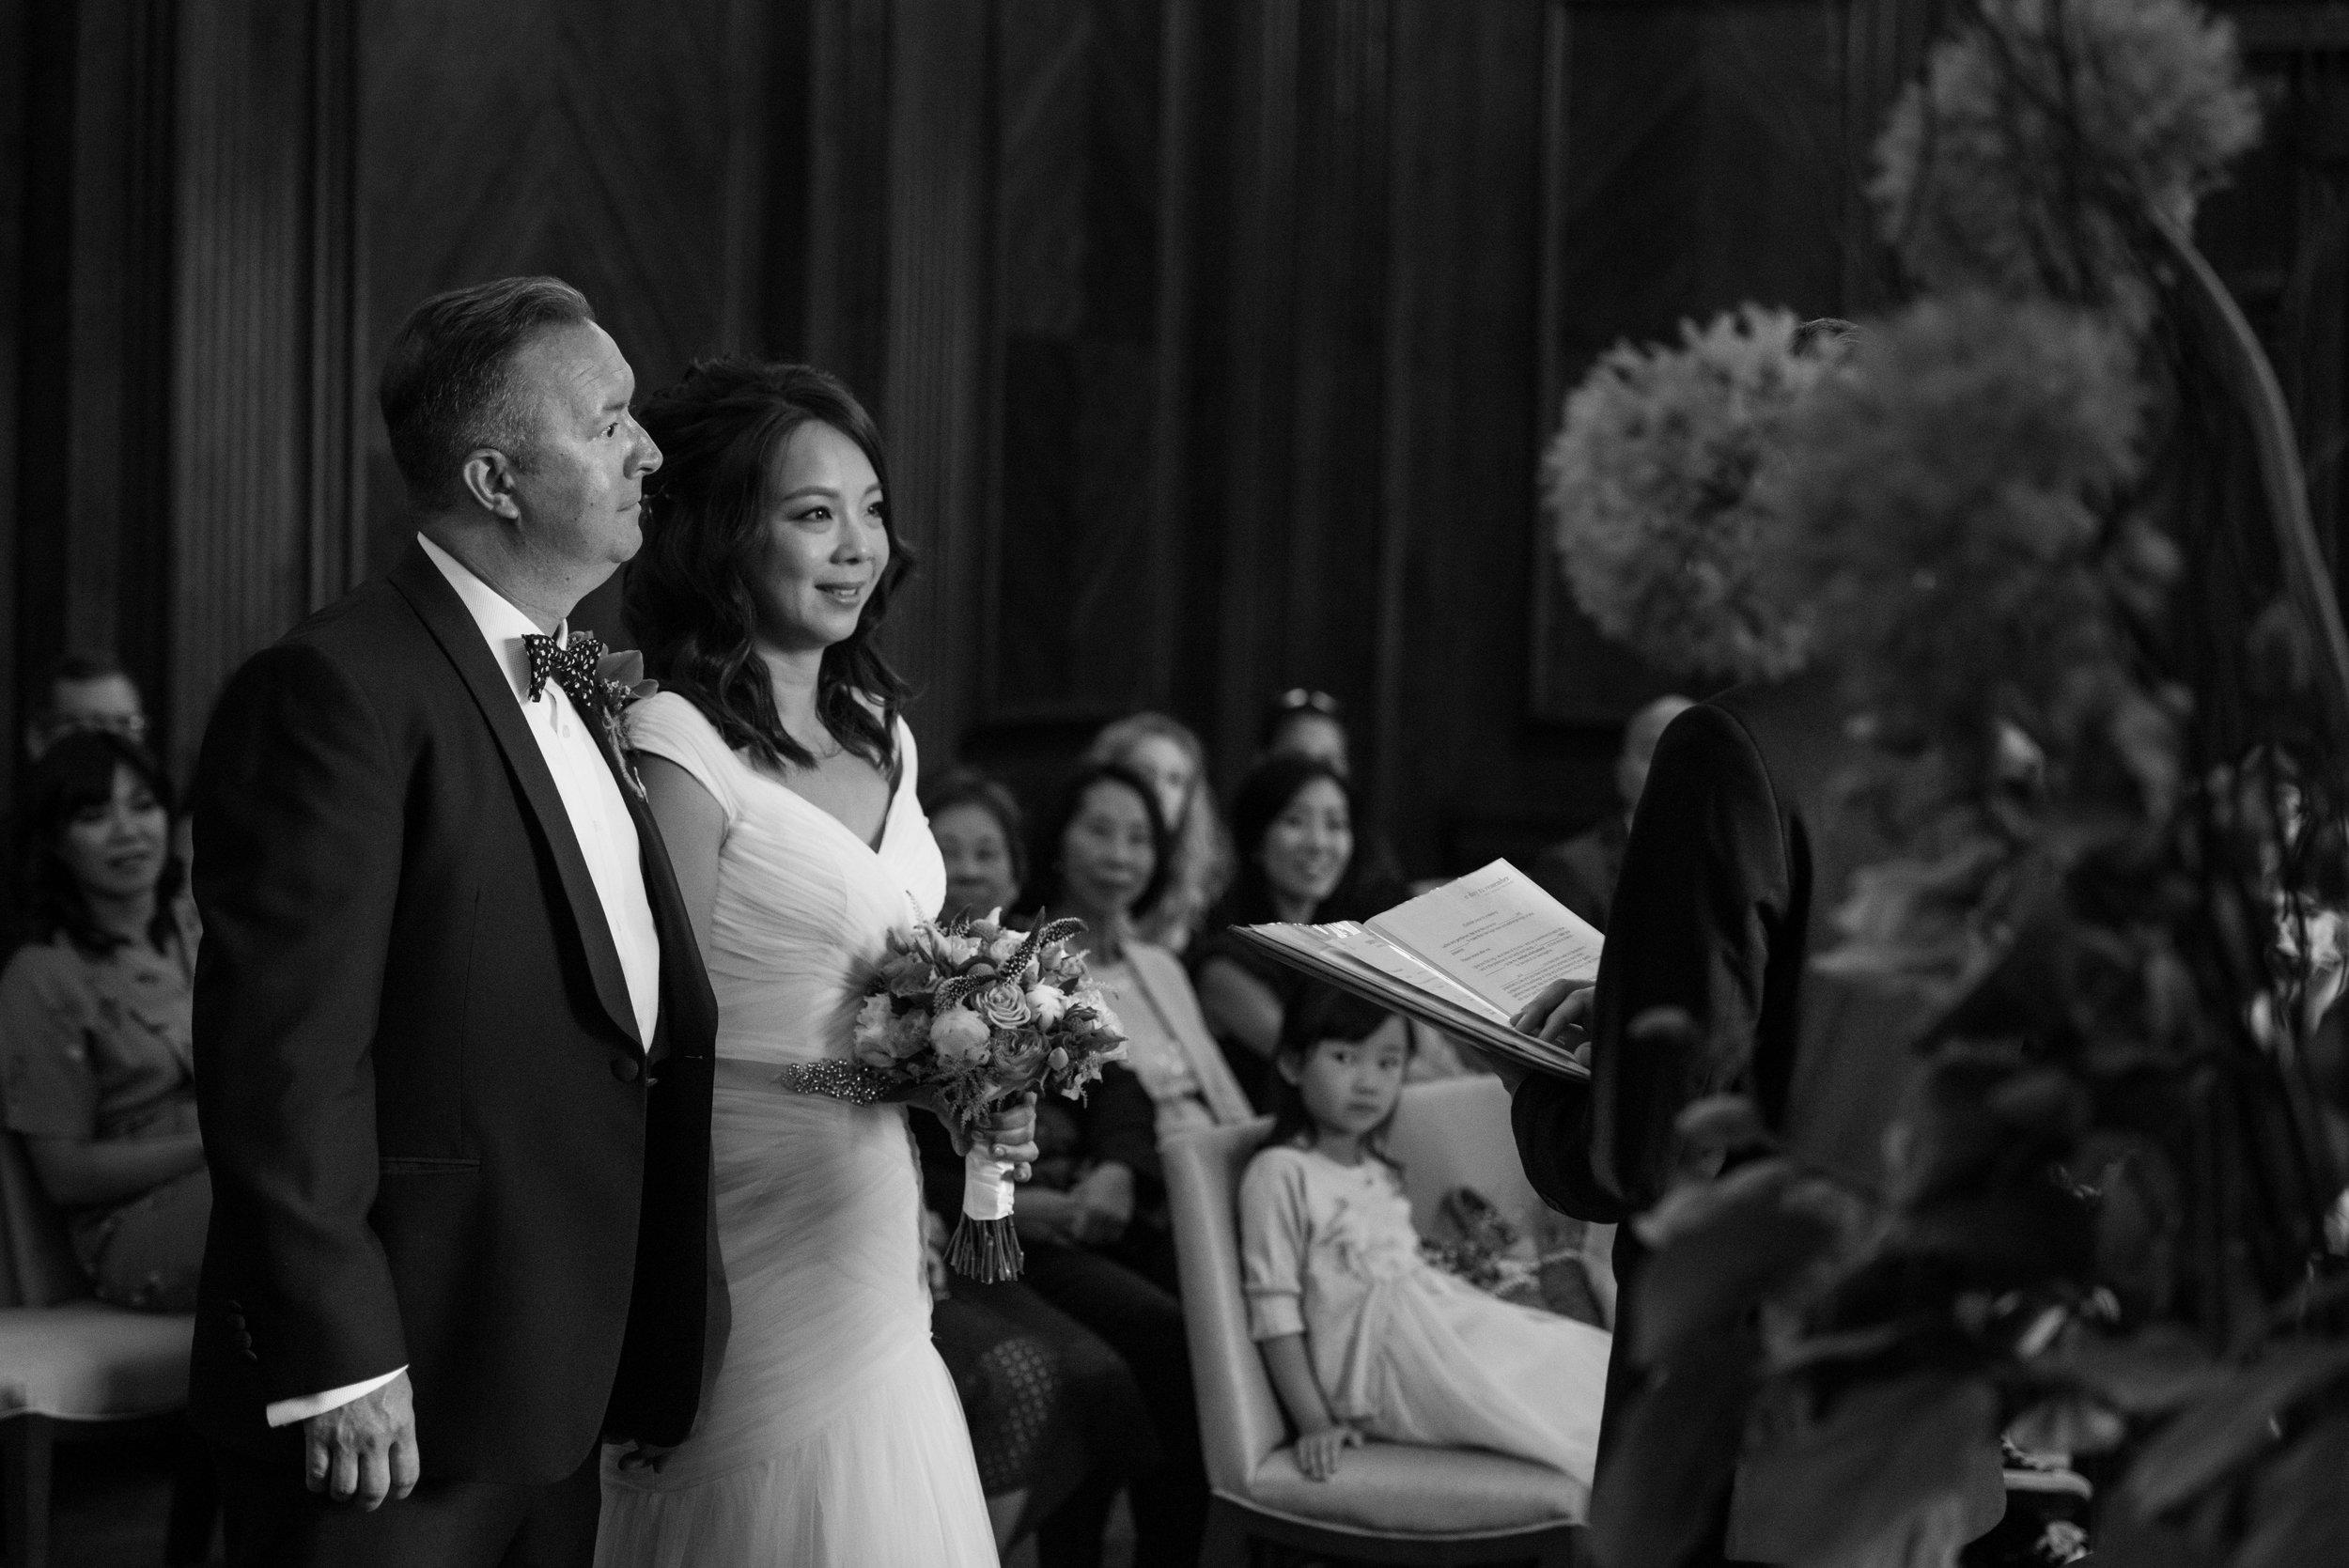 D&M_Marylebone Town Hall Wedding (98 of 239).jpg